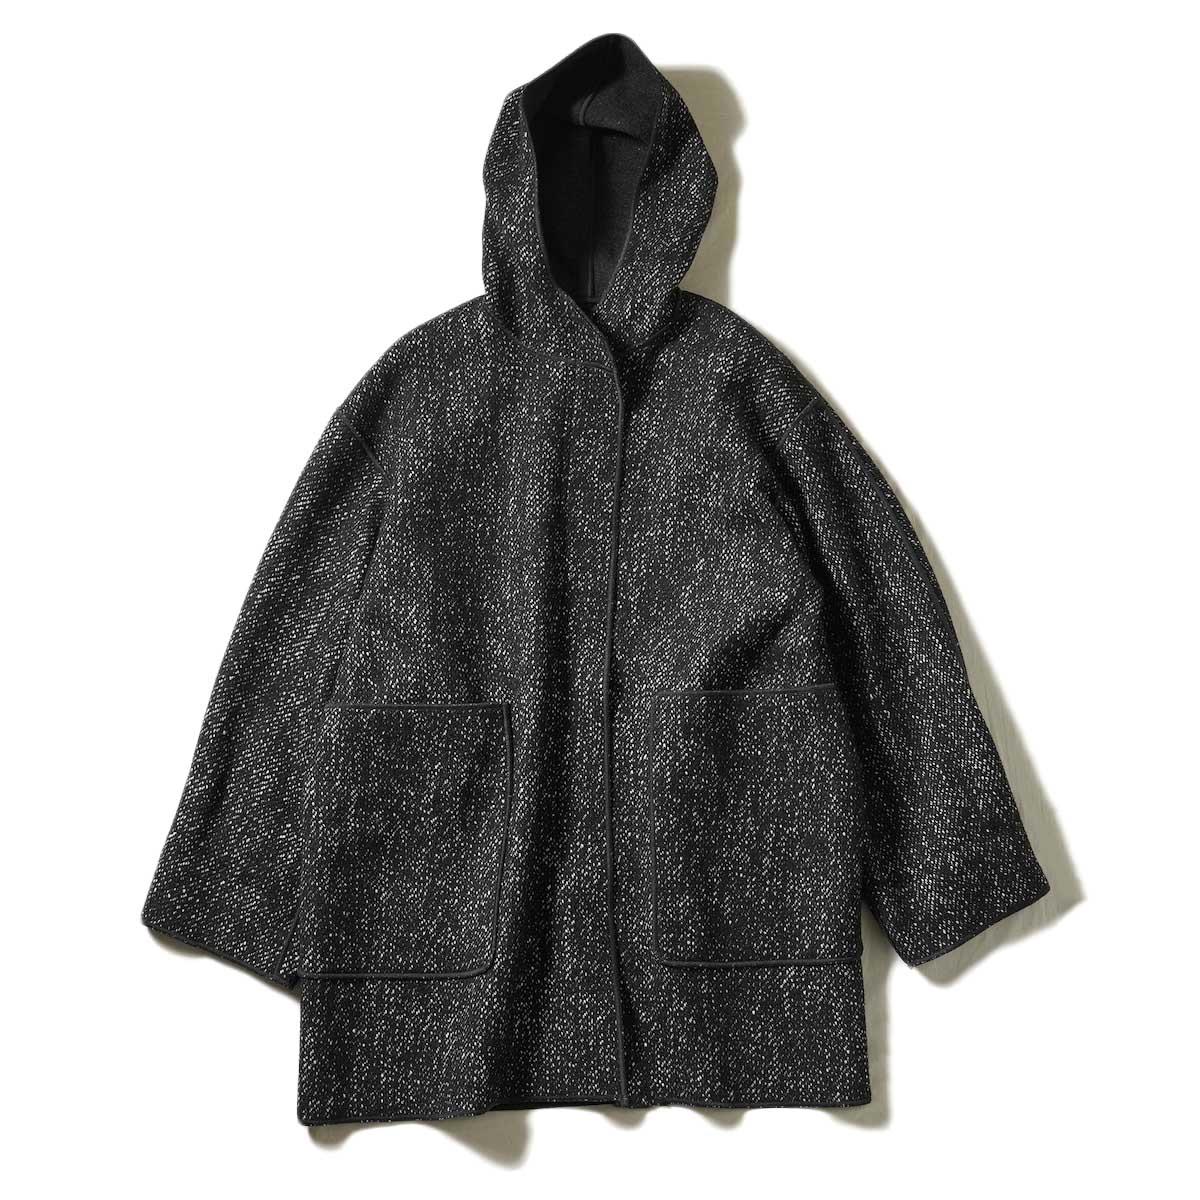 YLEVE / TWEED×WOOL DOUBLE CLOTH RIVERSIBLE COAT (Black)